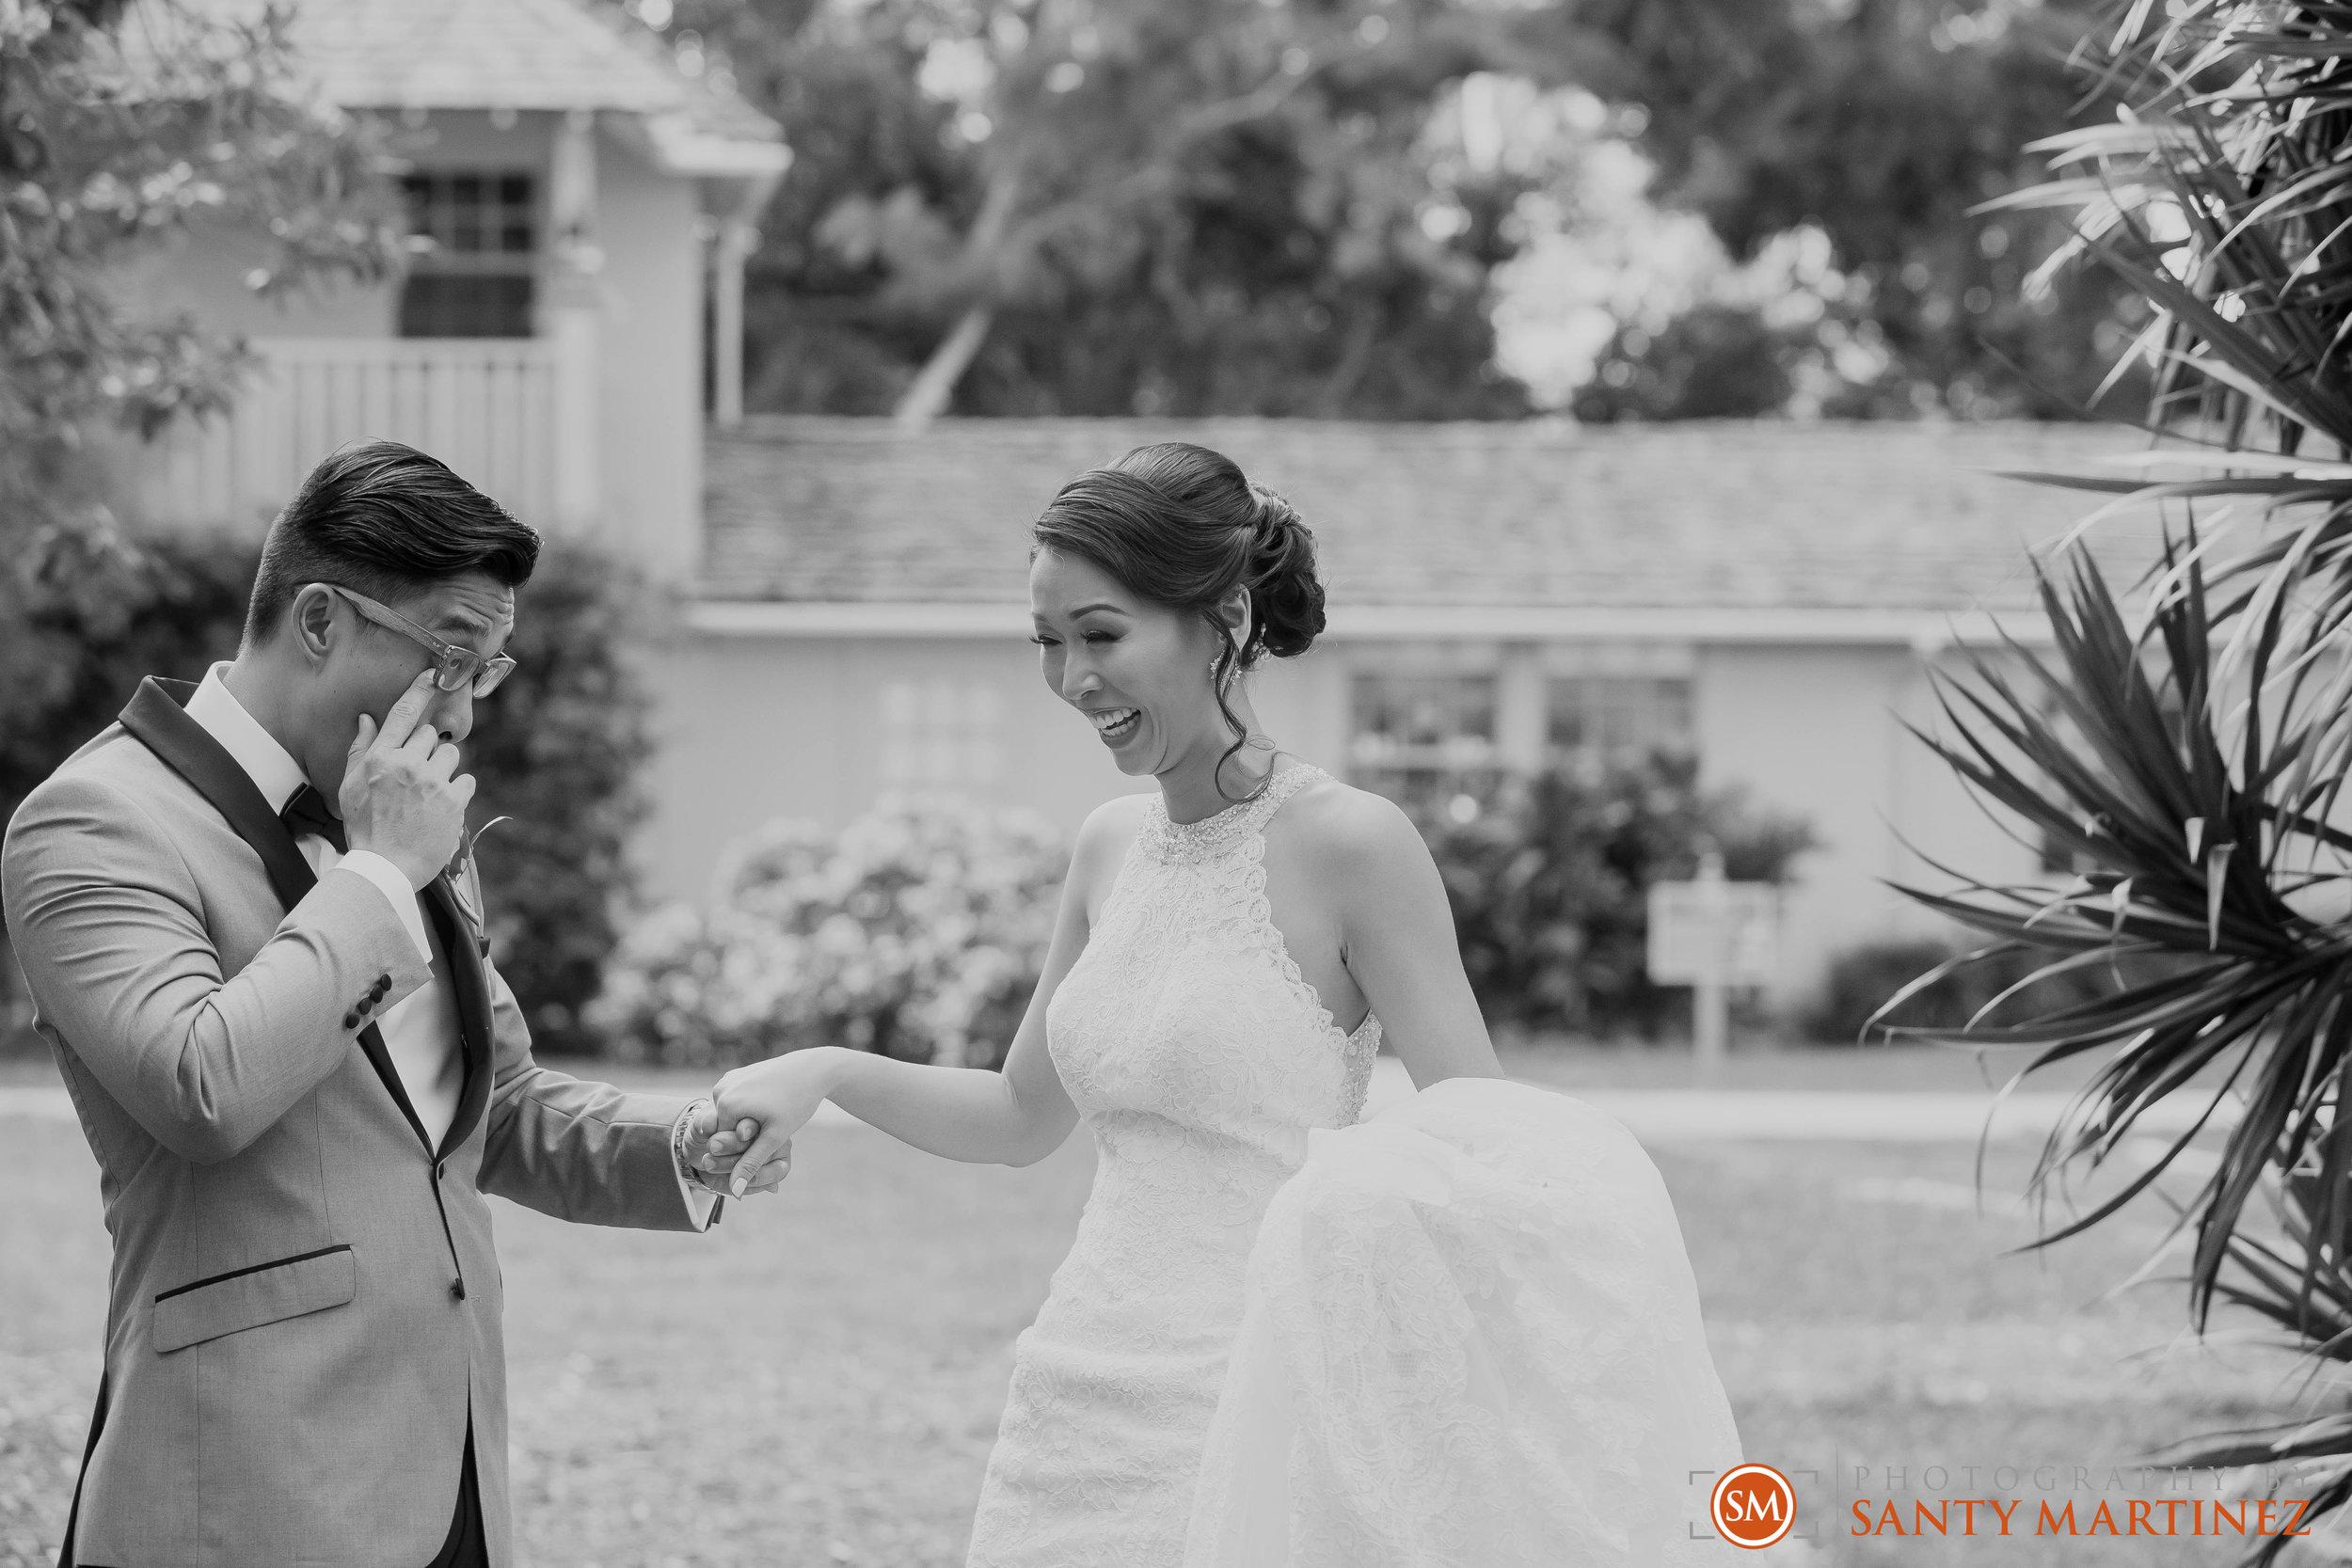 Wedding Bonnet House - Photography by Santy Martinez-13.jpg